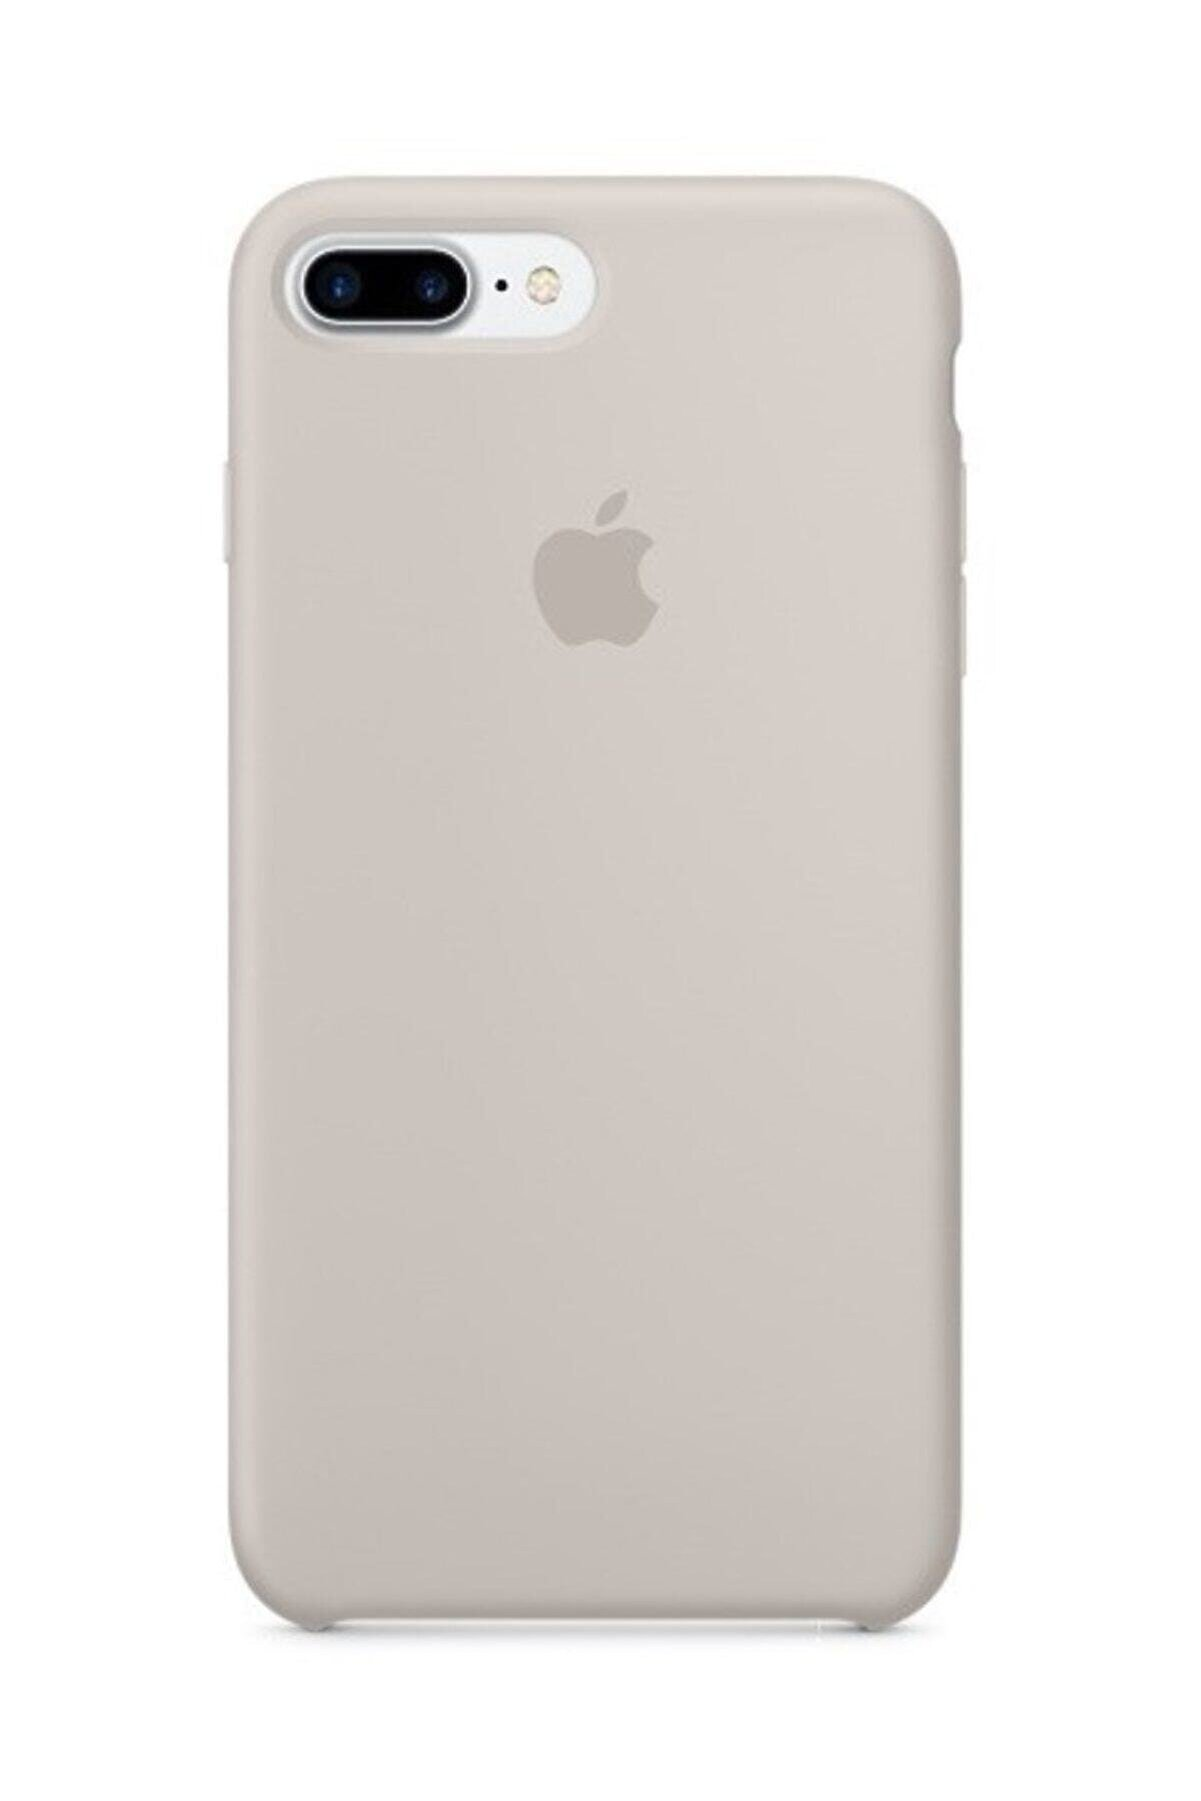 Telefon Aksesuarları Iphone 7 Plus 8 Plus Silikon Taş Rengi Kılıf